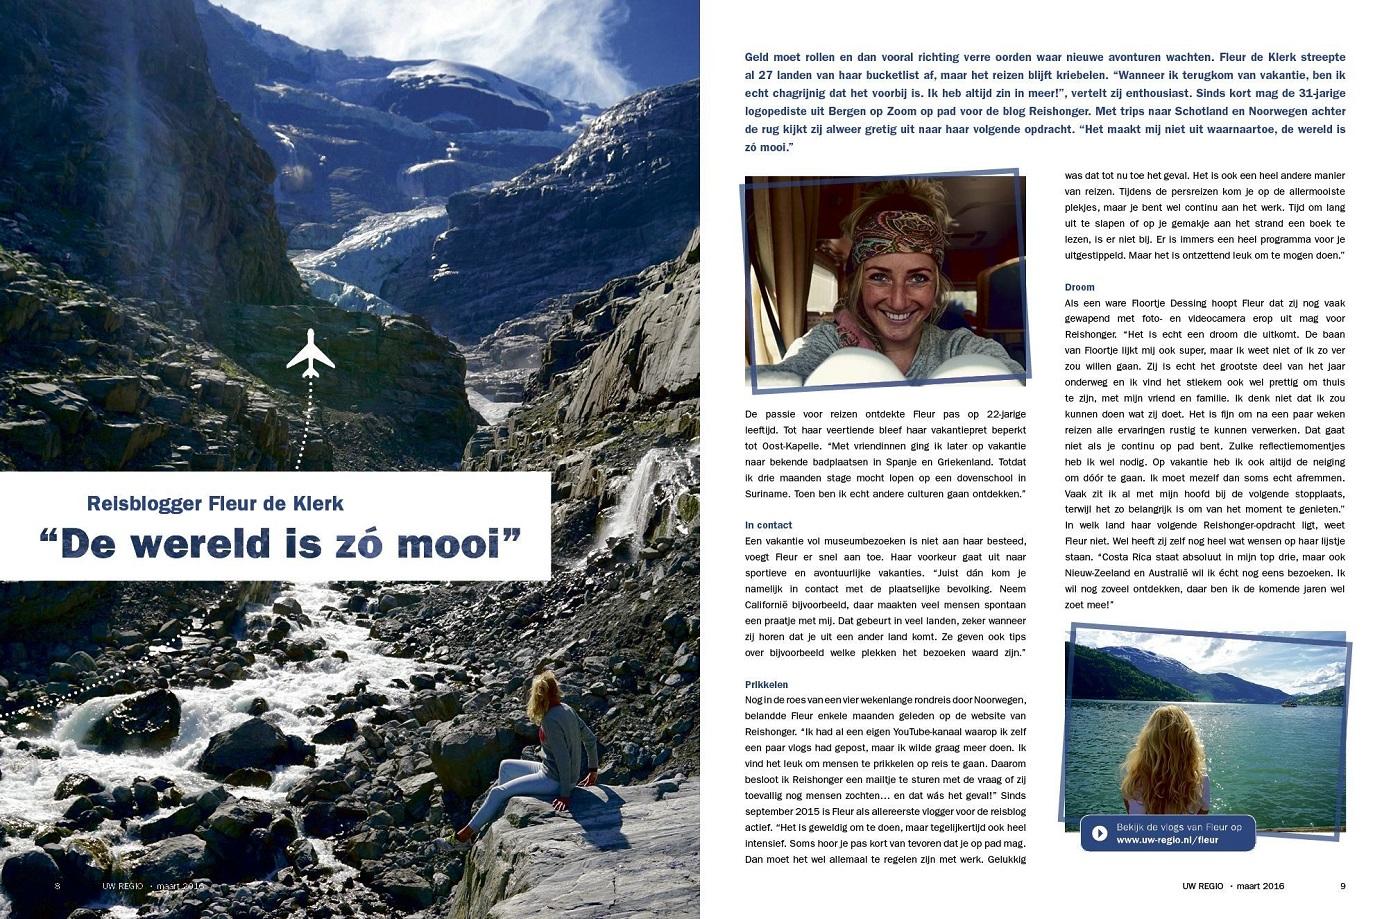 Reishonger in Uw Regio Magazine